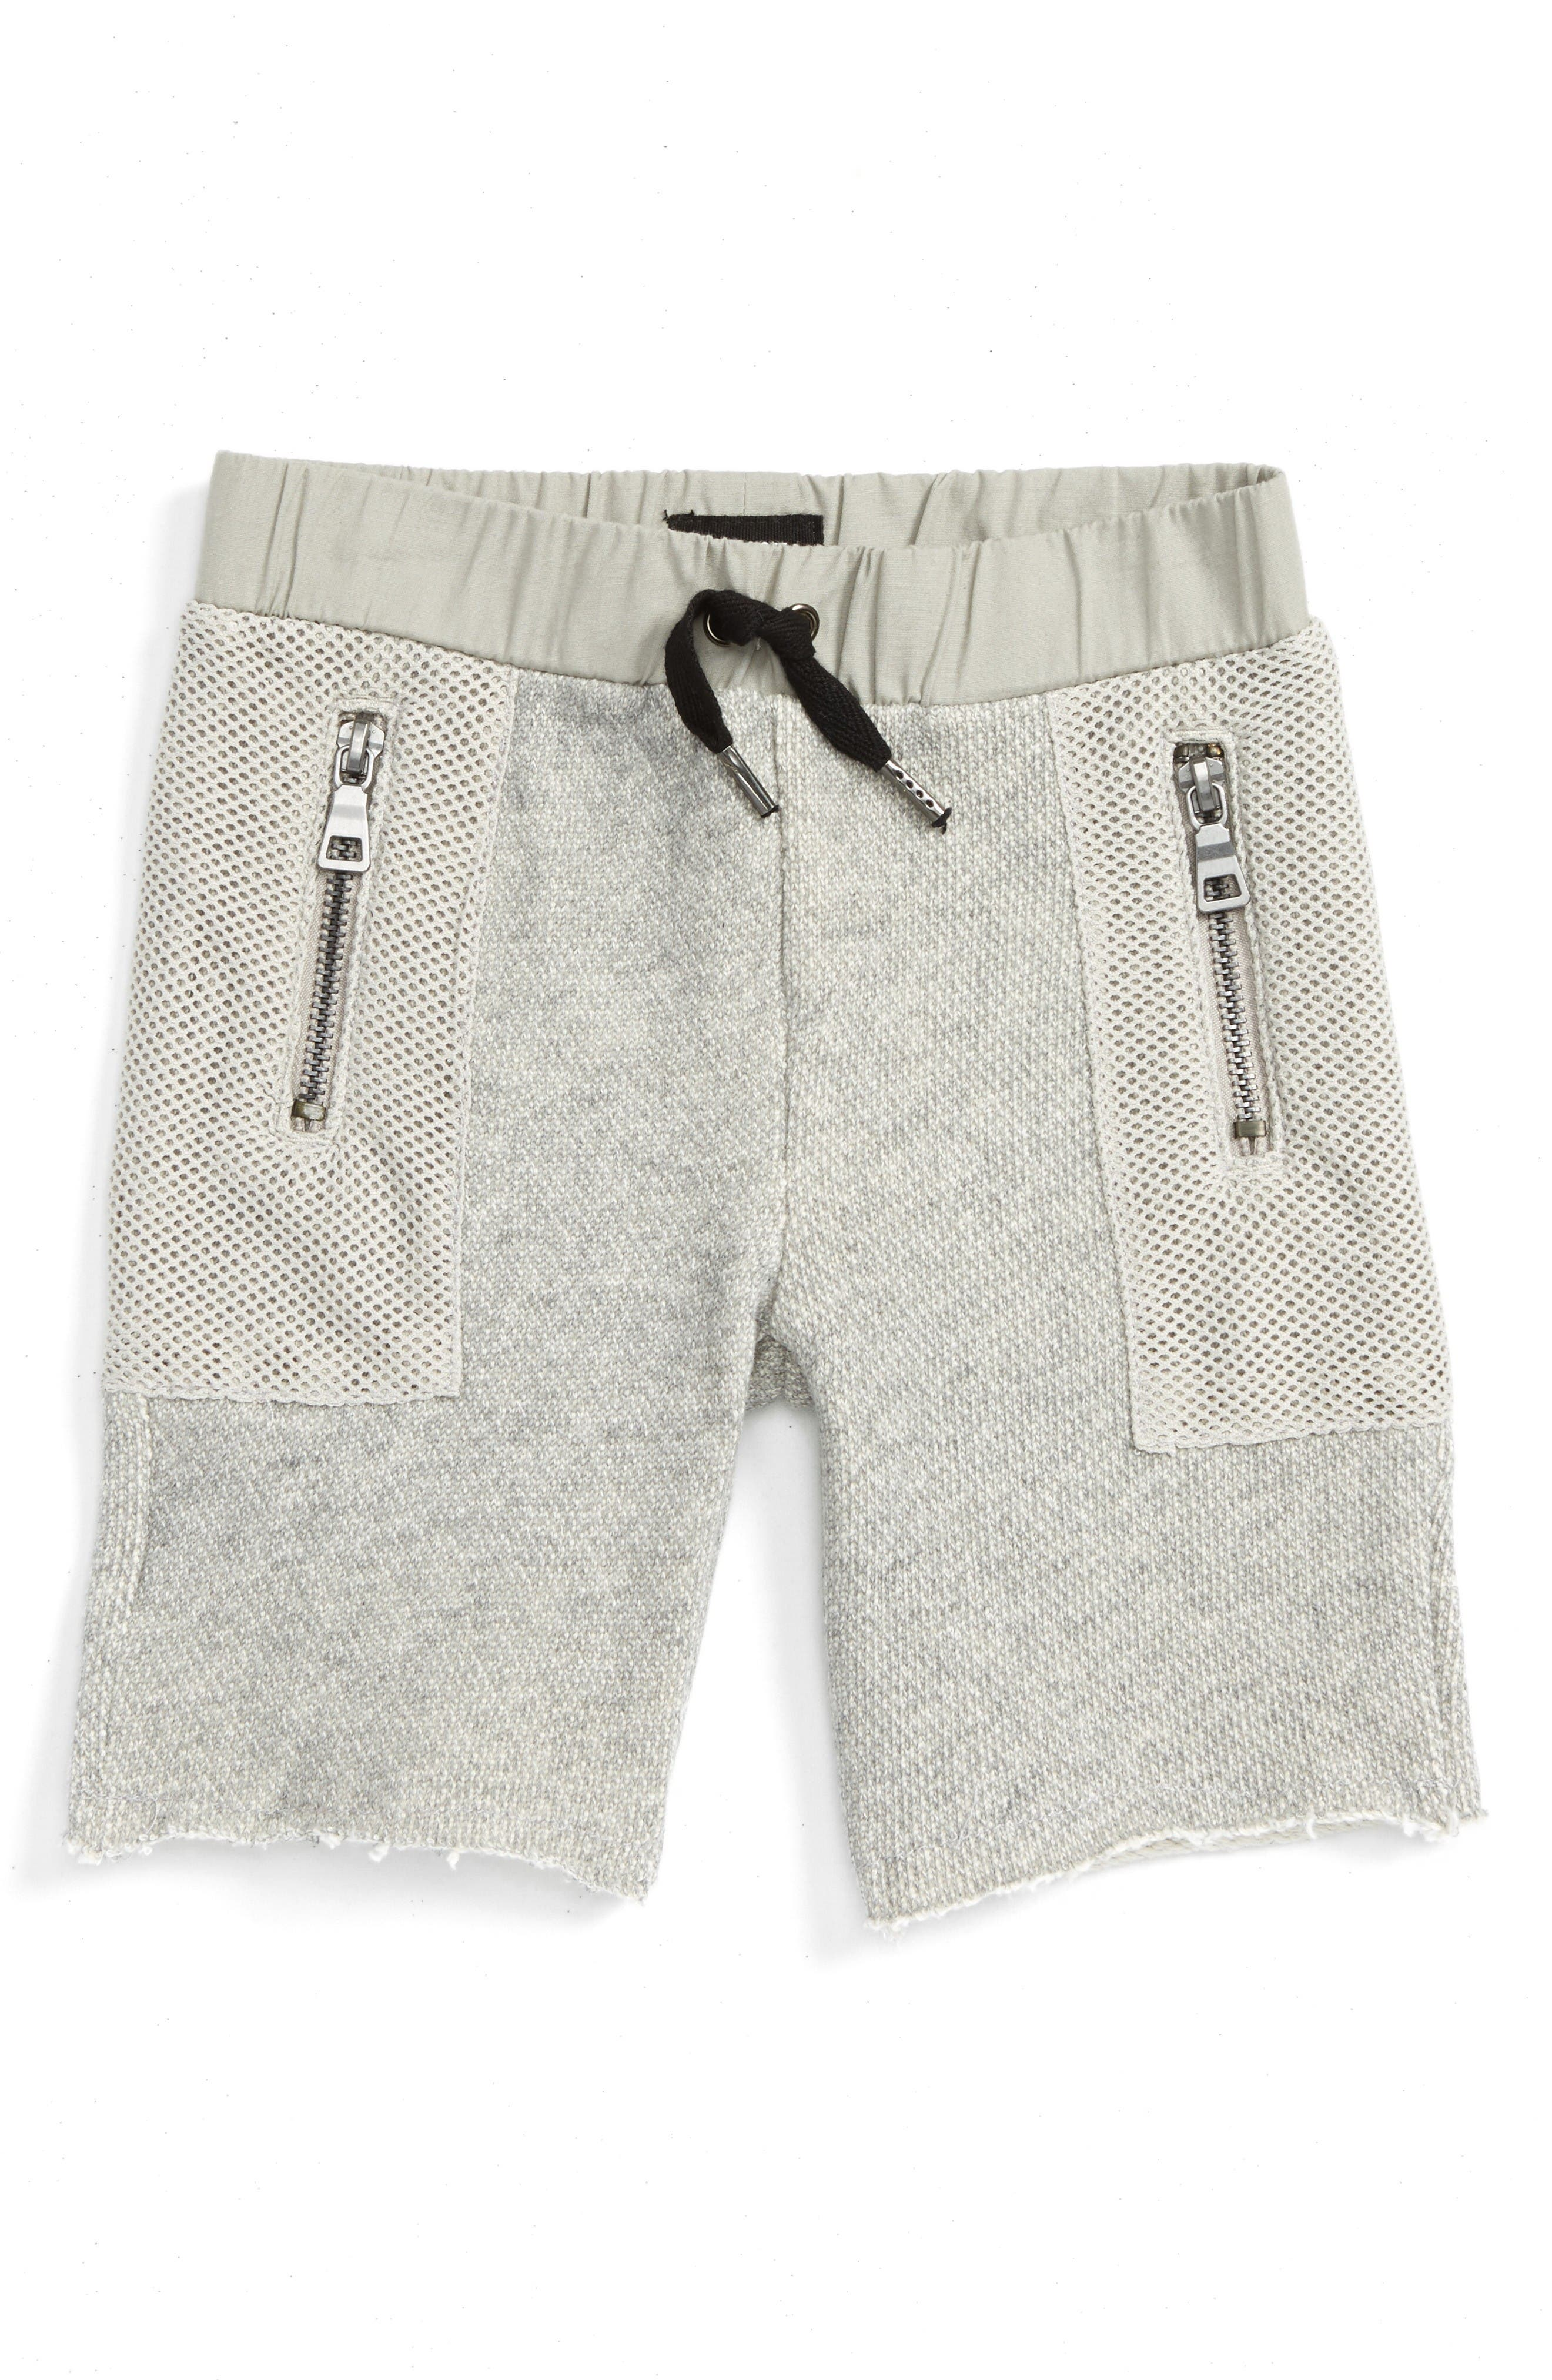 High Tech Shorts,                         Main,                         color, Charcoal